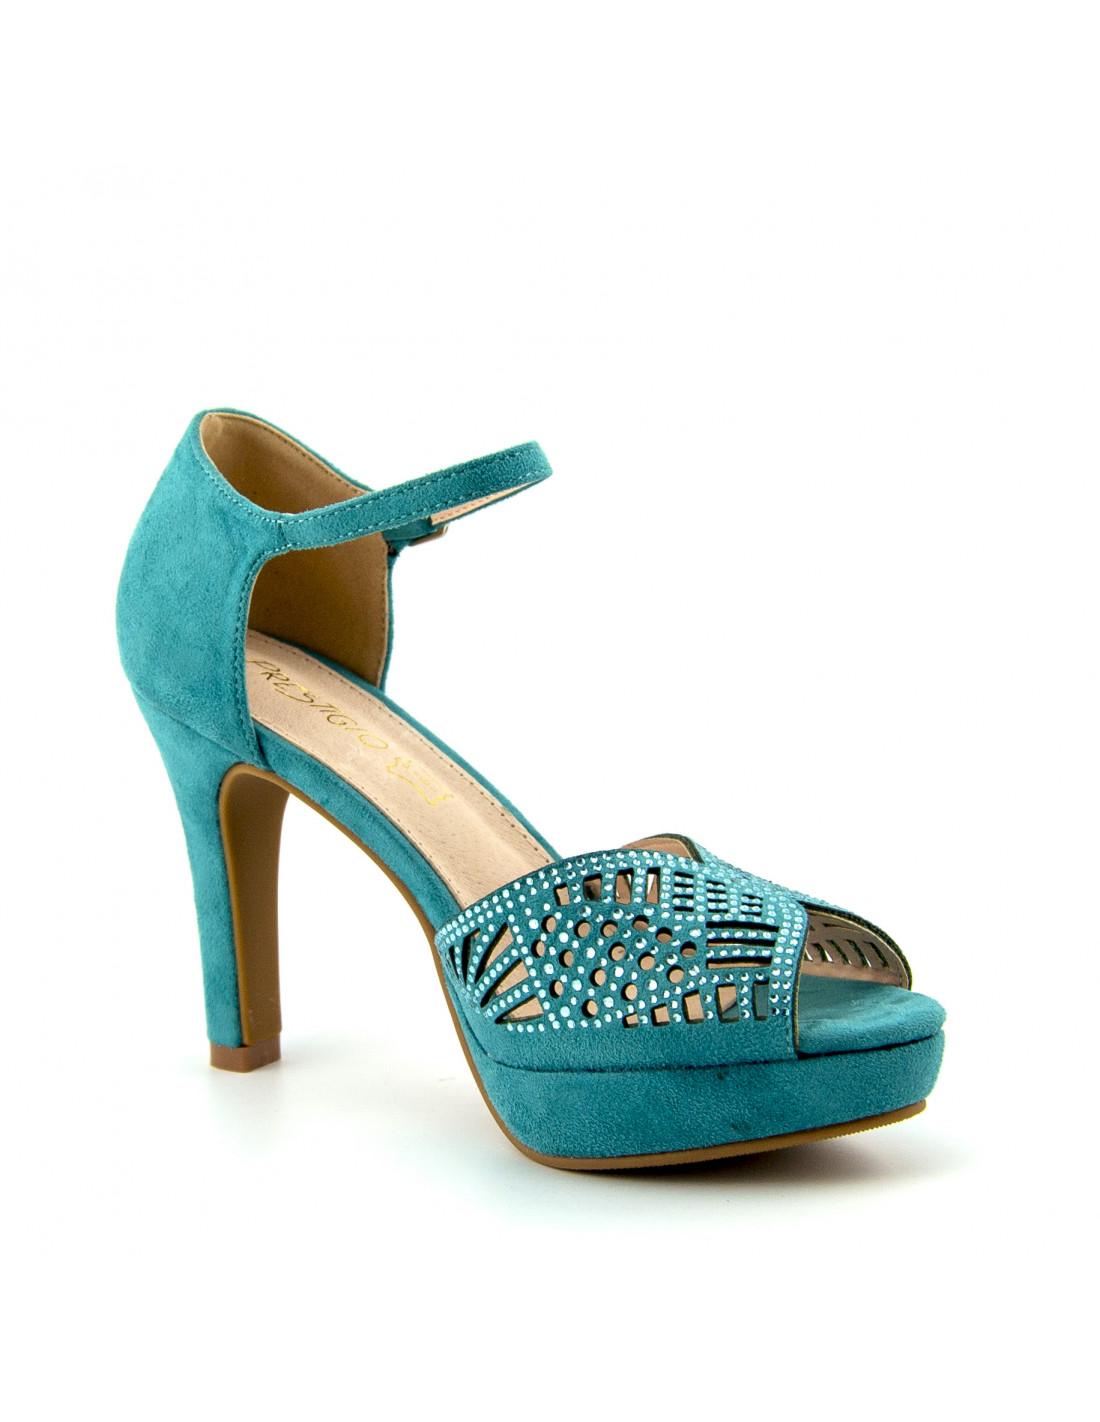 0b0b47e88d8a6 sandalia fiesta mujer tacón color turquesa muy elegante plantilla piel